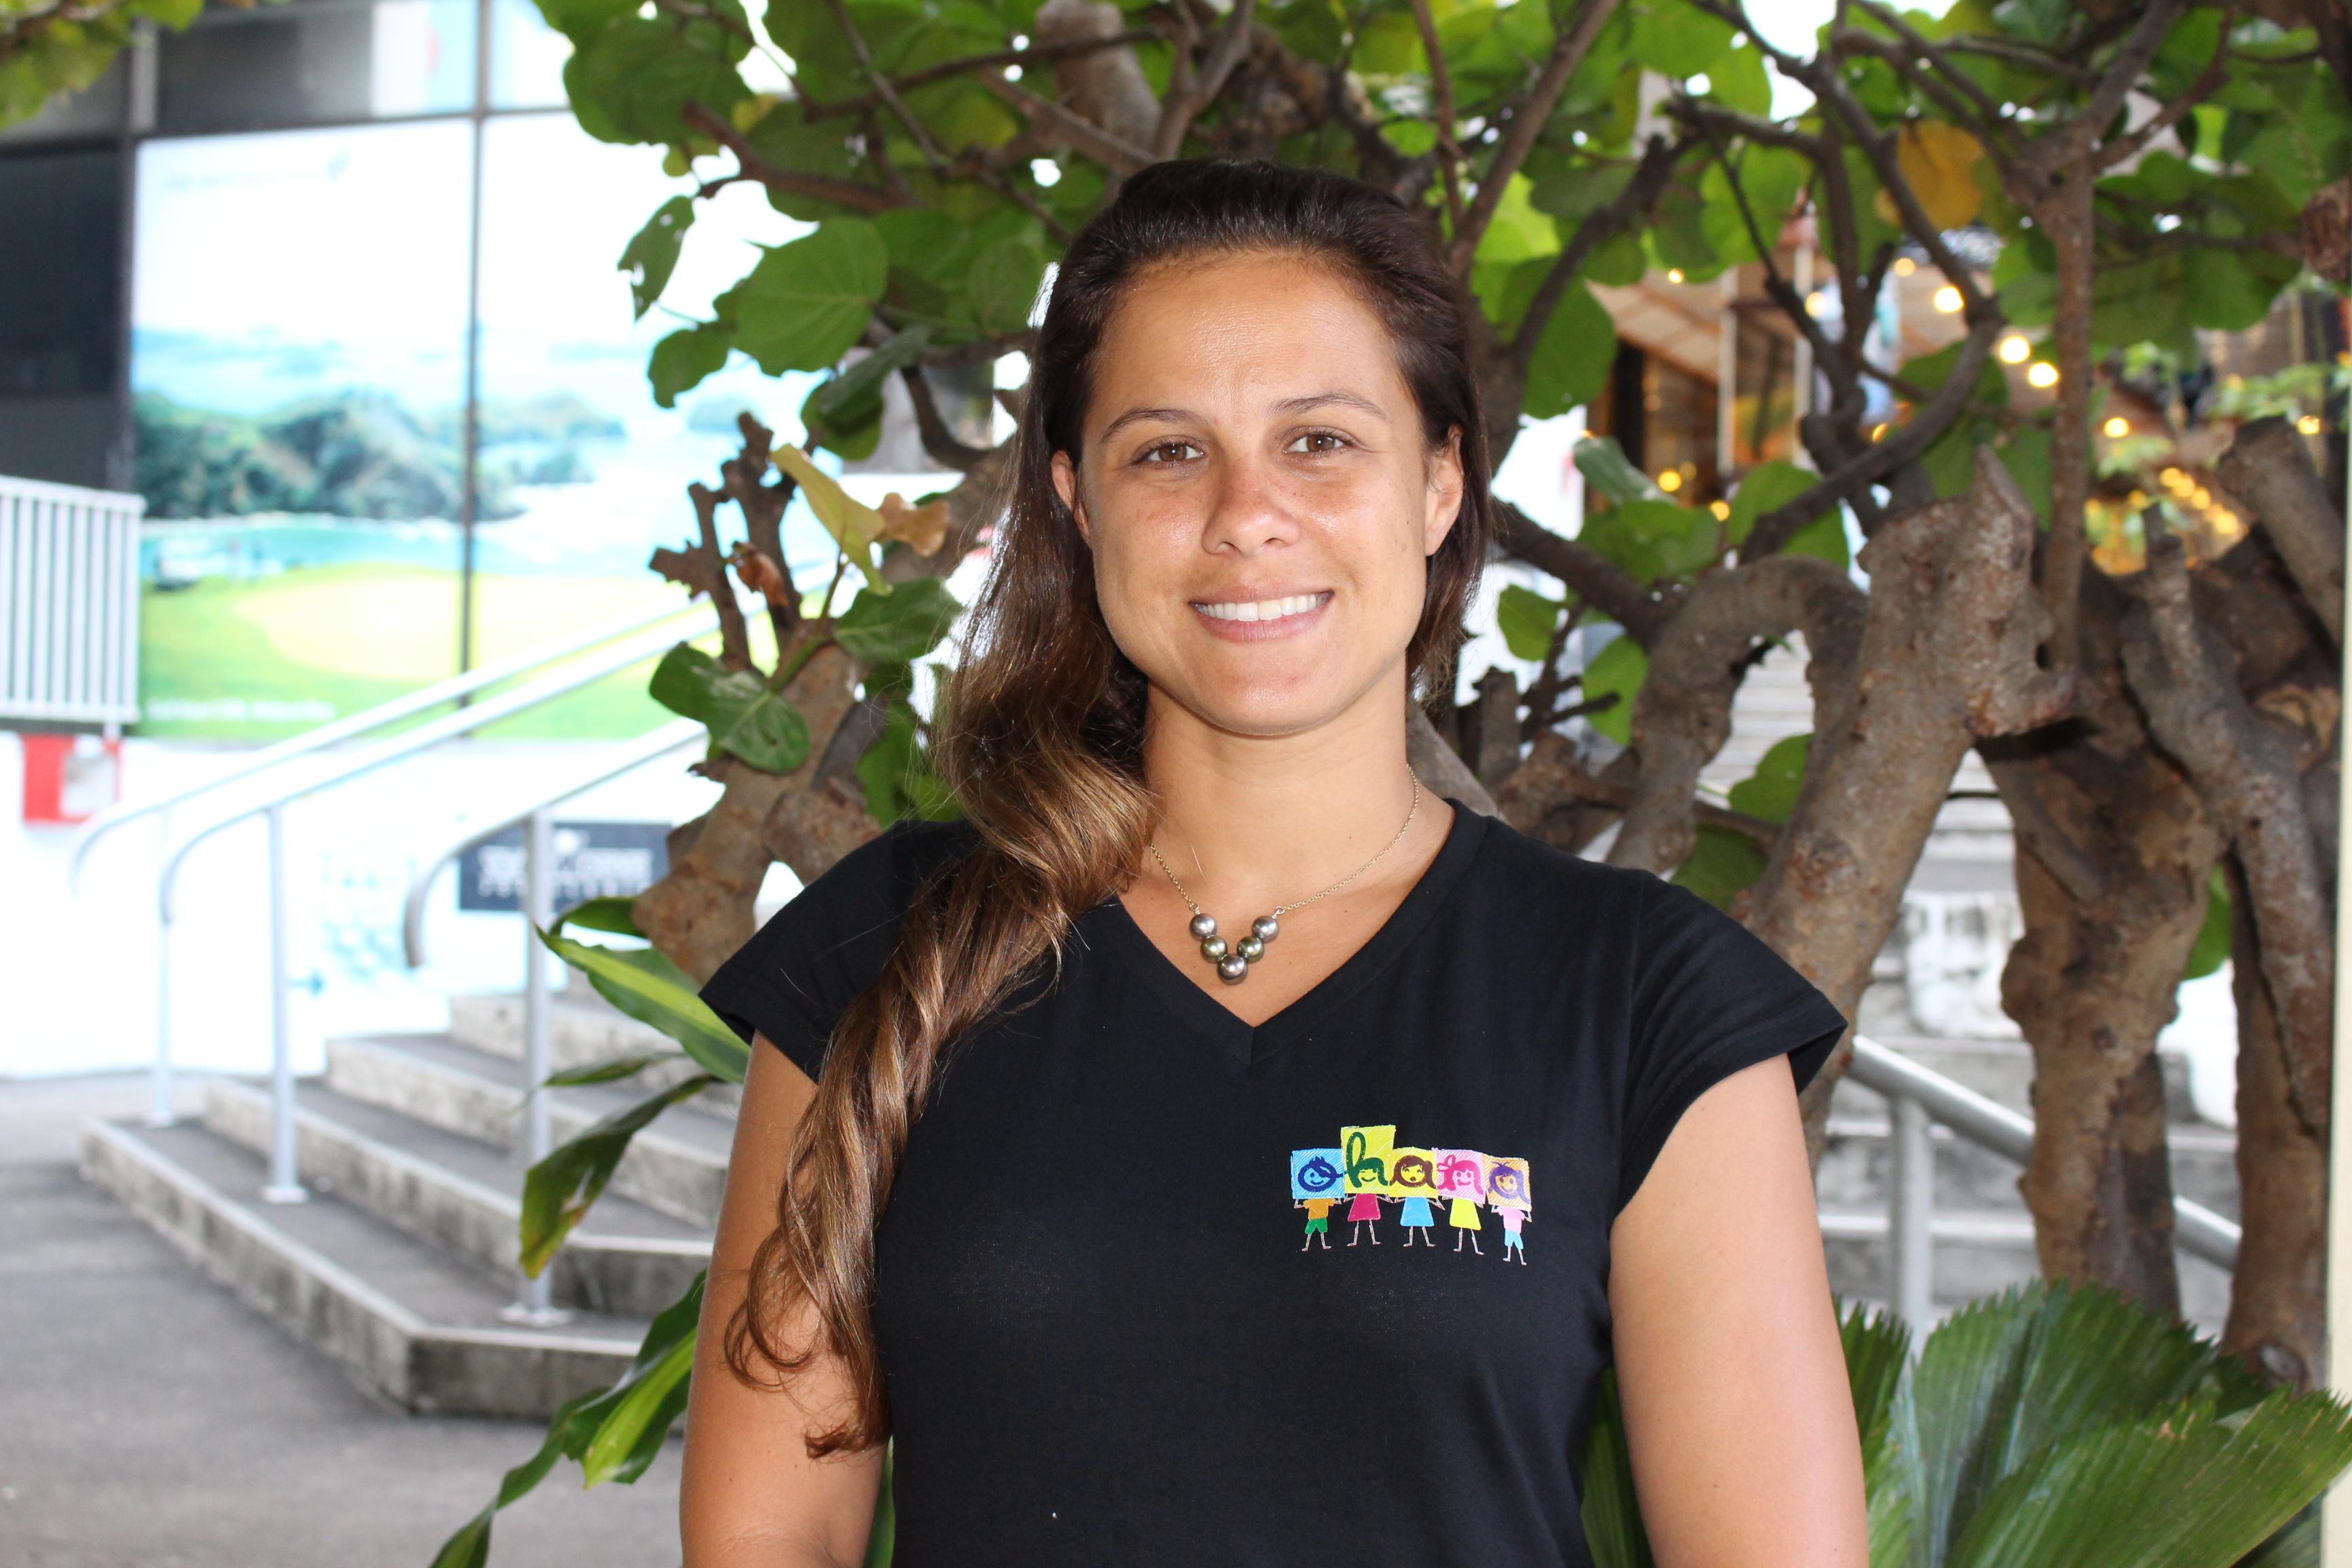 Natalia Germain, fondatrice du collectif Ohana Tahiti.